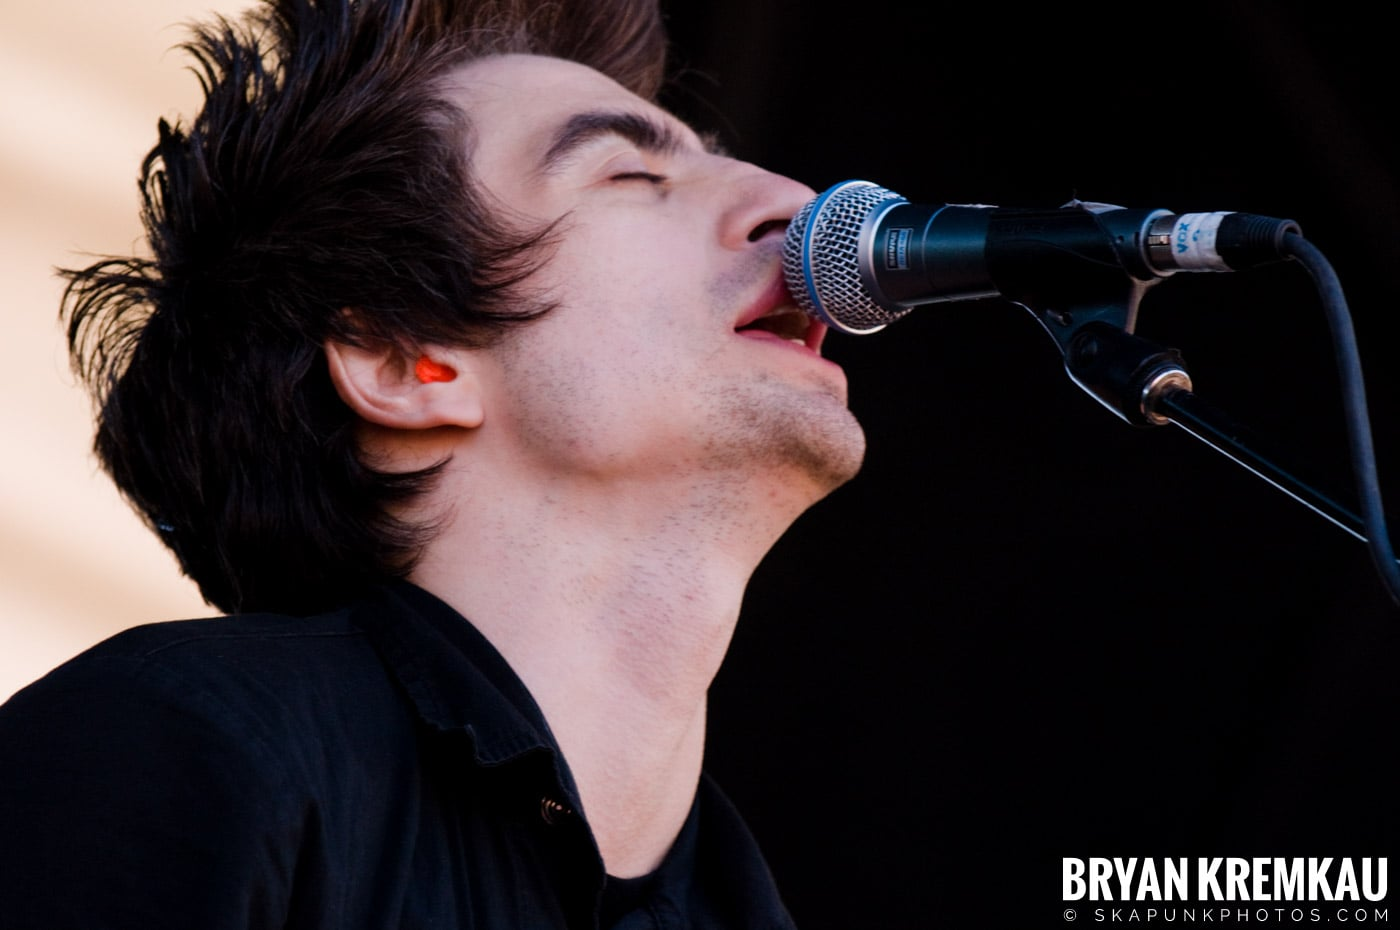 Anti-Flag @ Warped Tour 2009, Scranton PA - 07.15.09 (6)